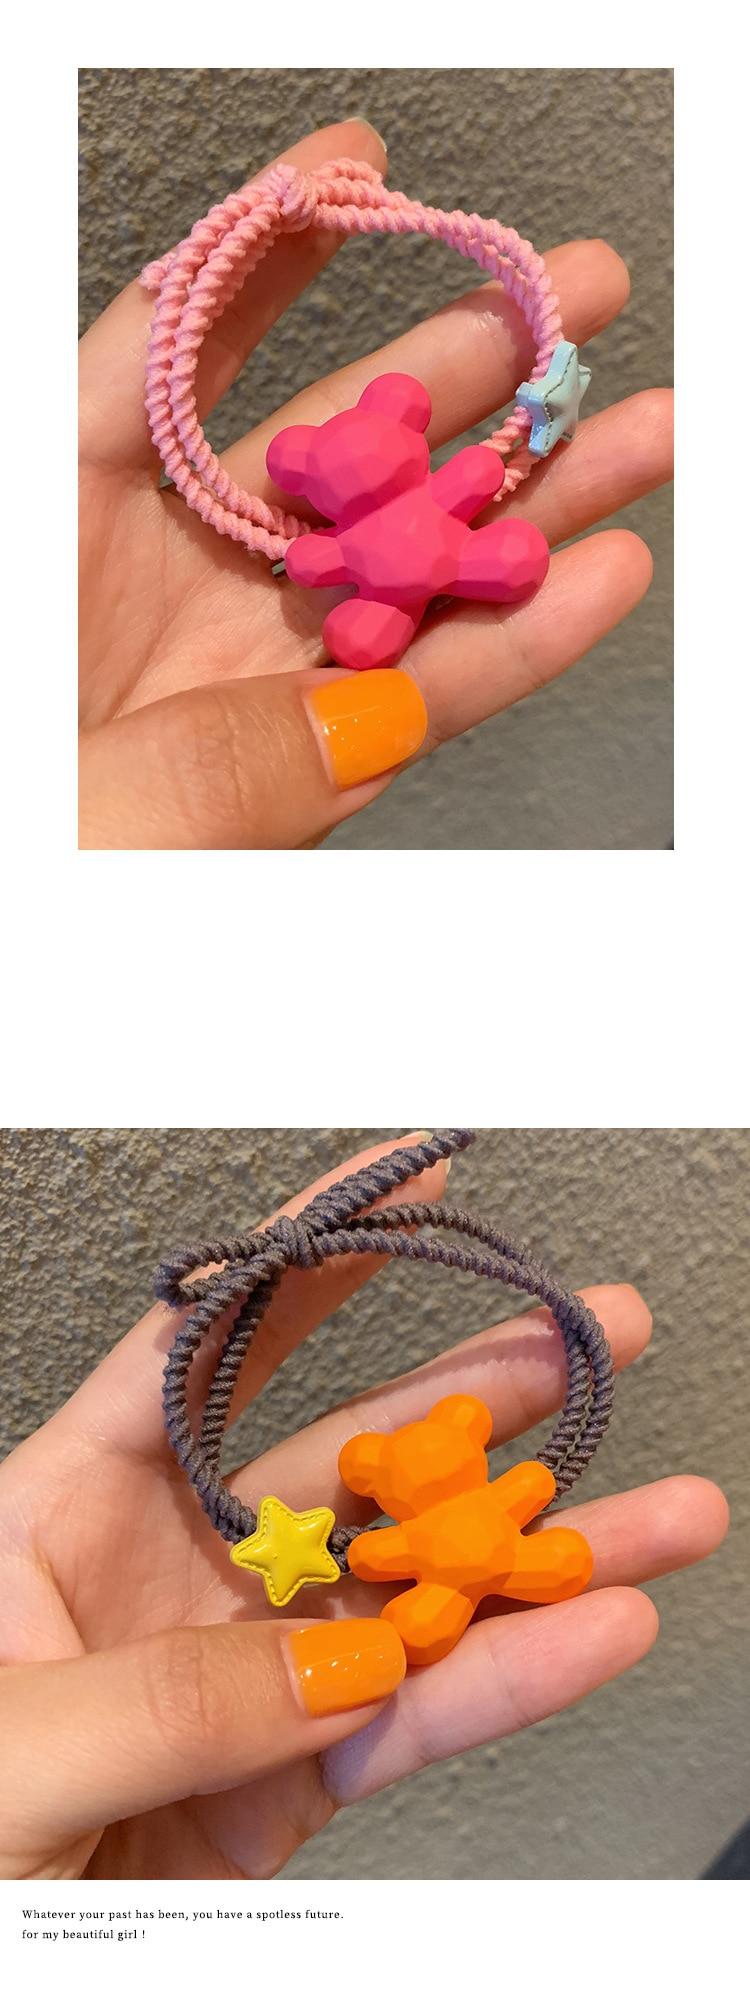 100 pçs lote DIY Simples Colore Doces